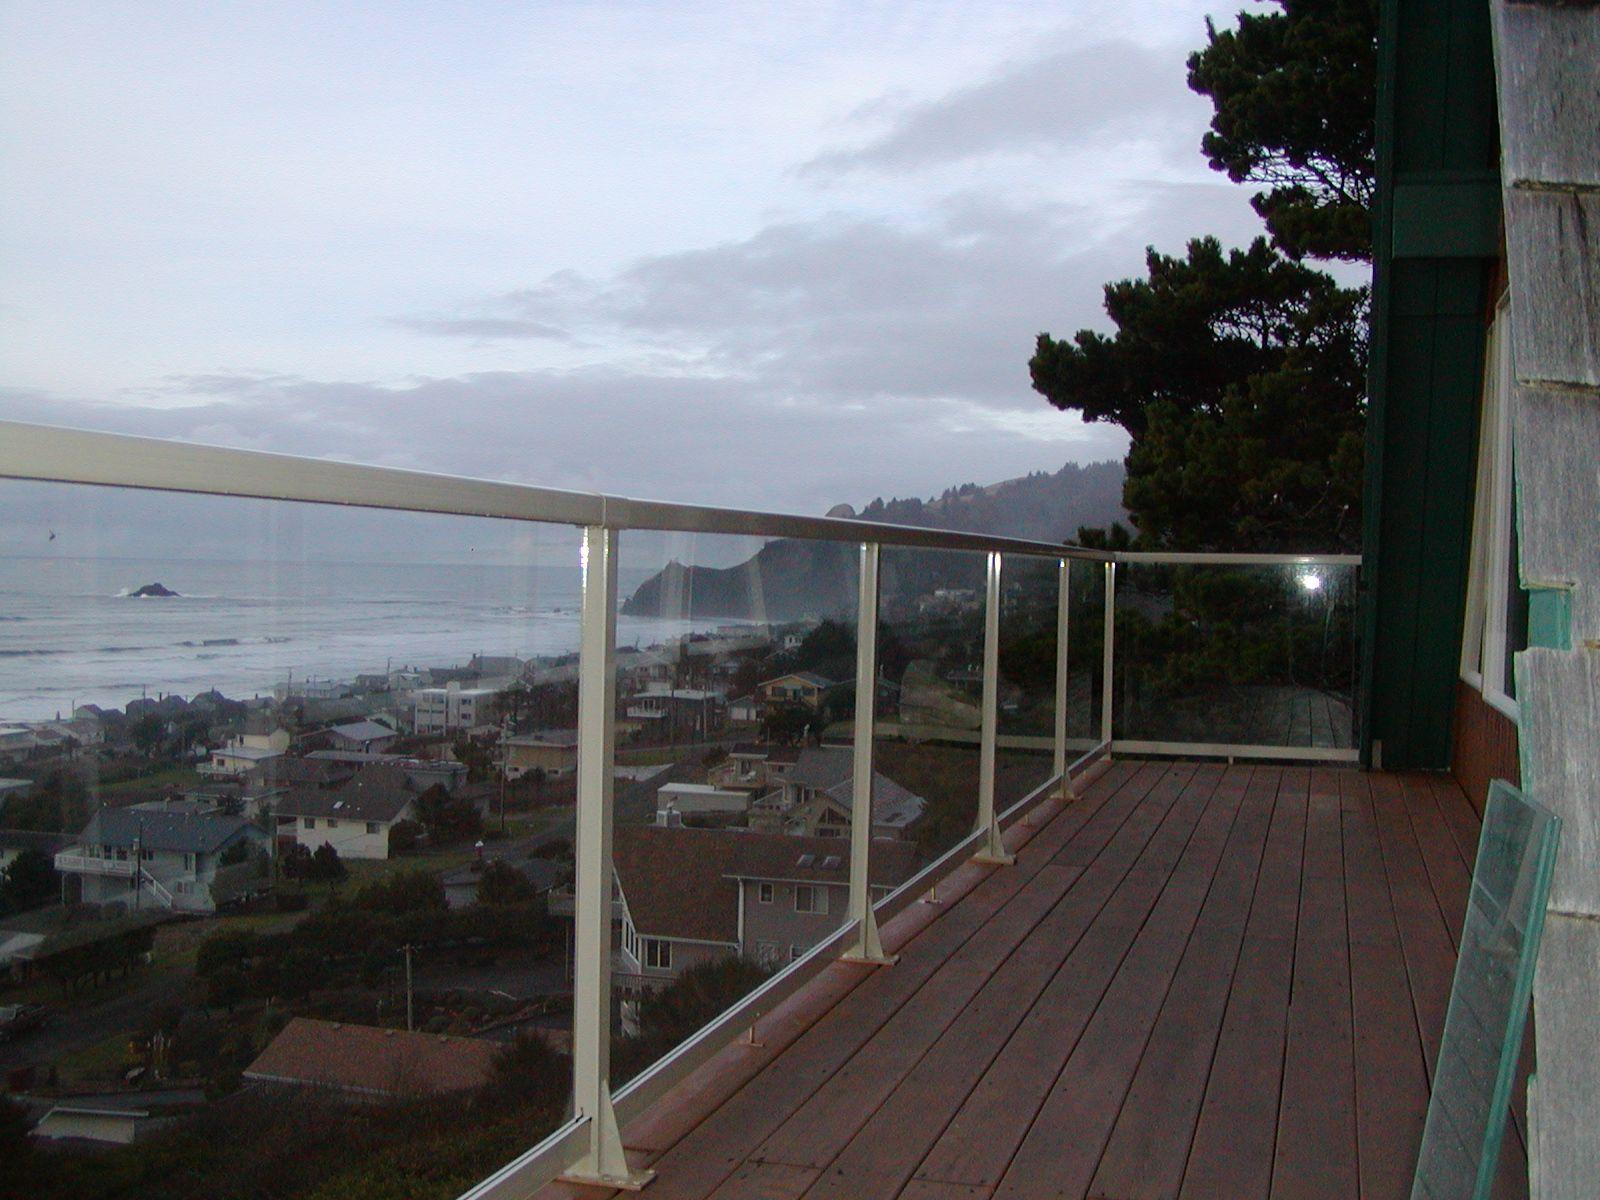 Best Clear Glass Railing 4 Home Stairways Railings 400 x 300